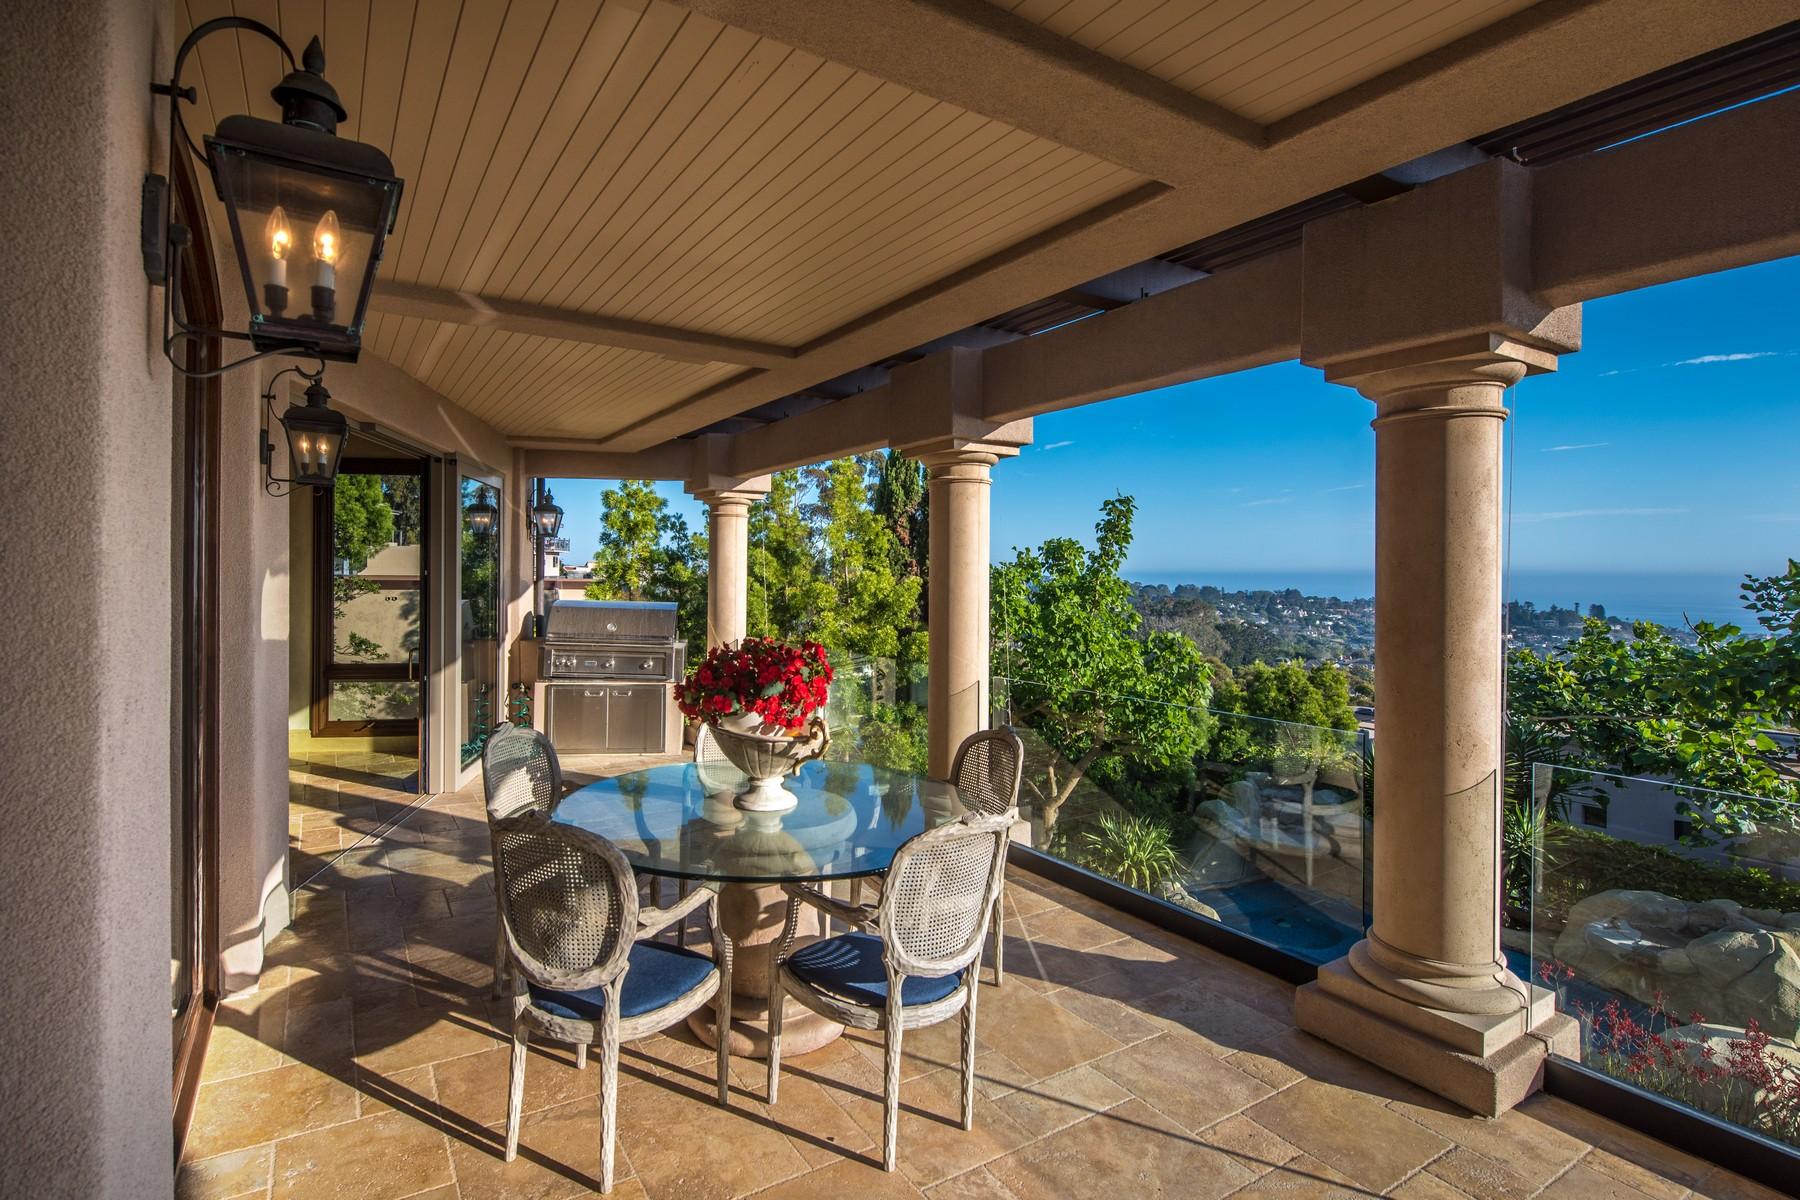 Additional photo for property listing at 7240 Encelia Drive  拉荷亚, 加利福尼亚州 92037 美国